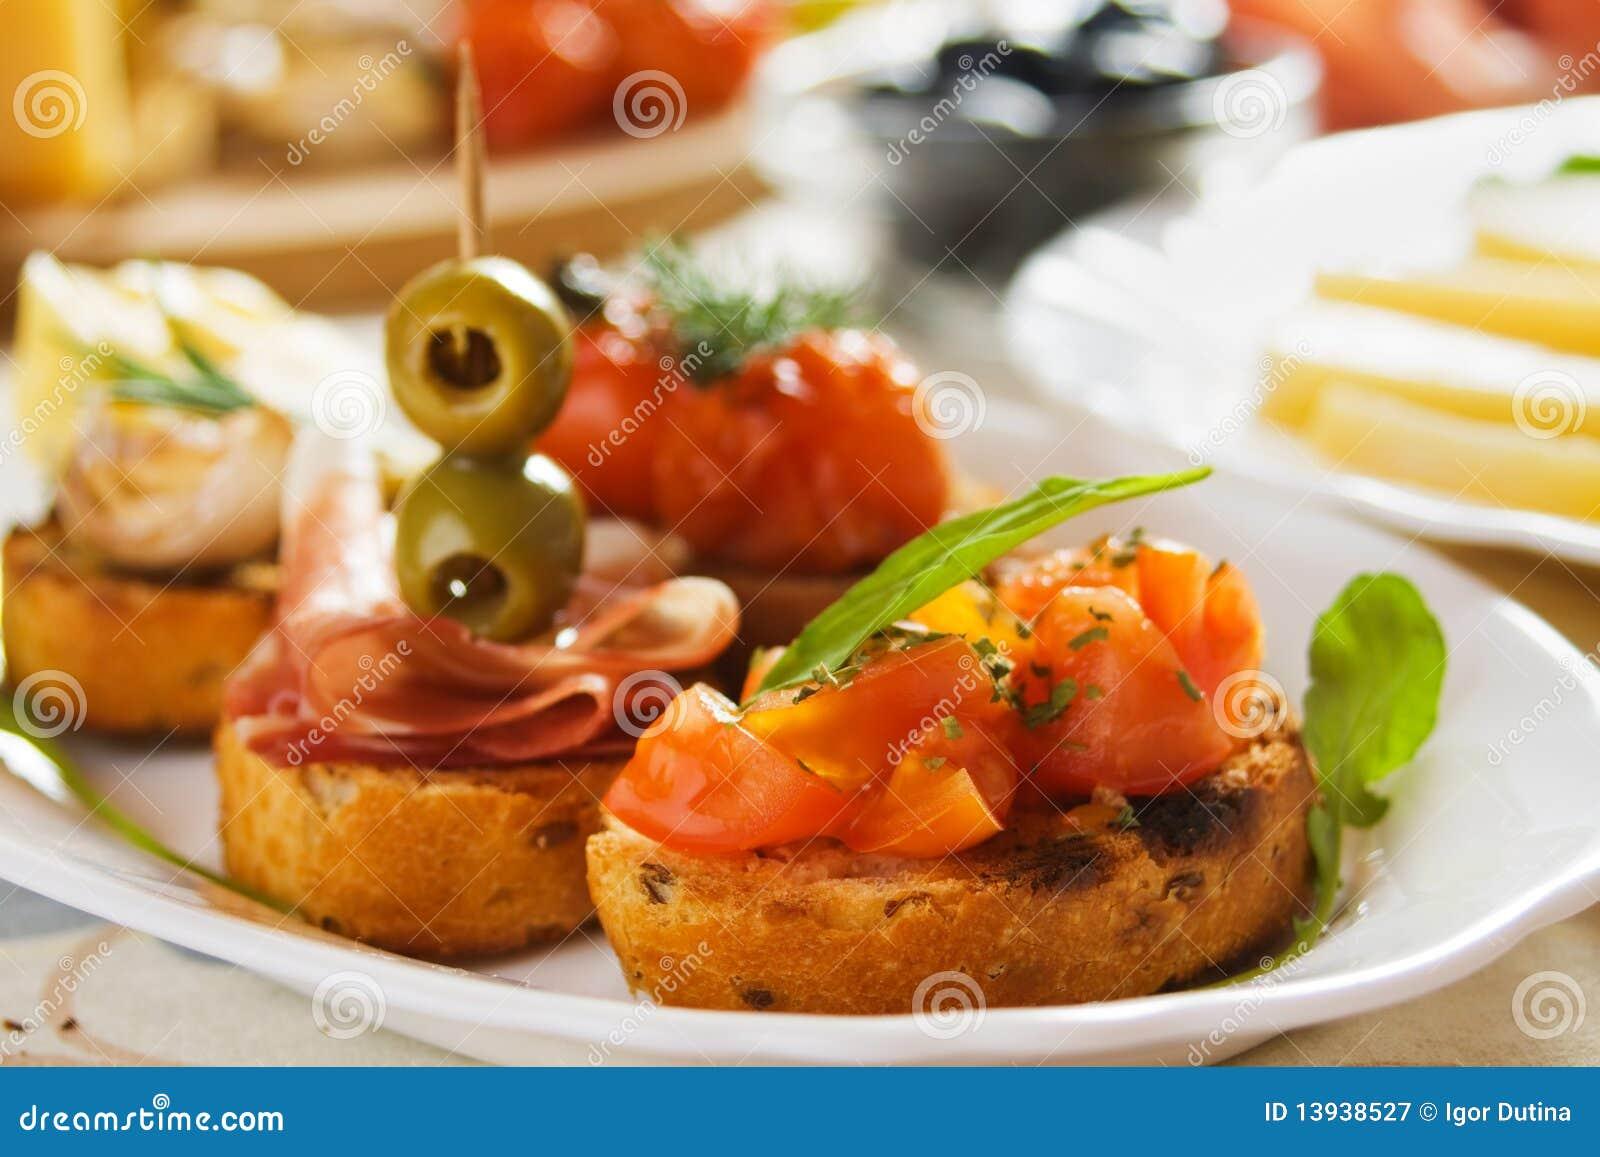 Bruschette com tomate, azeitonas e prosciutto